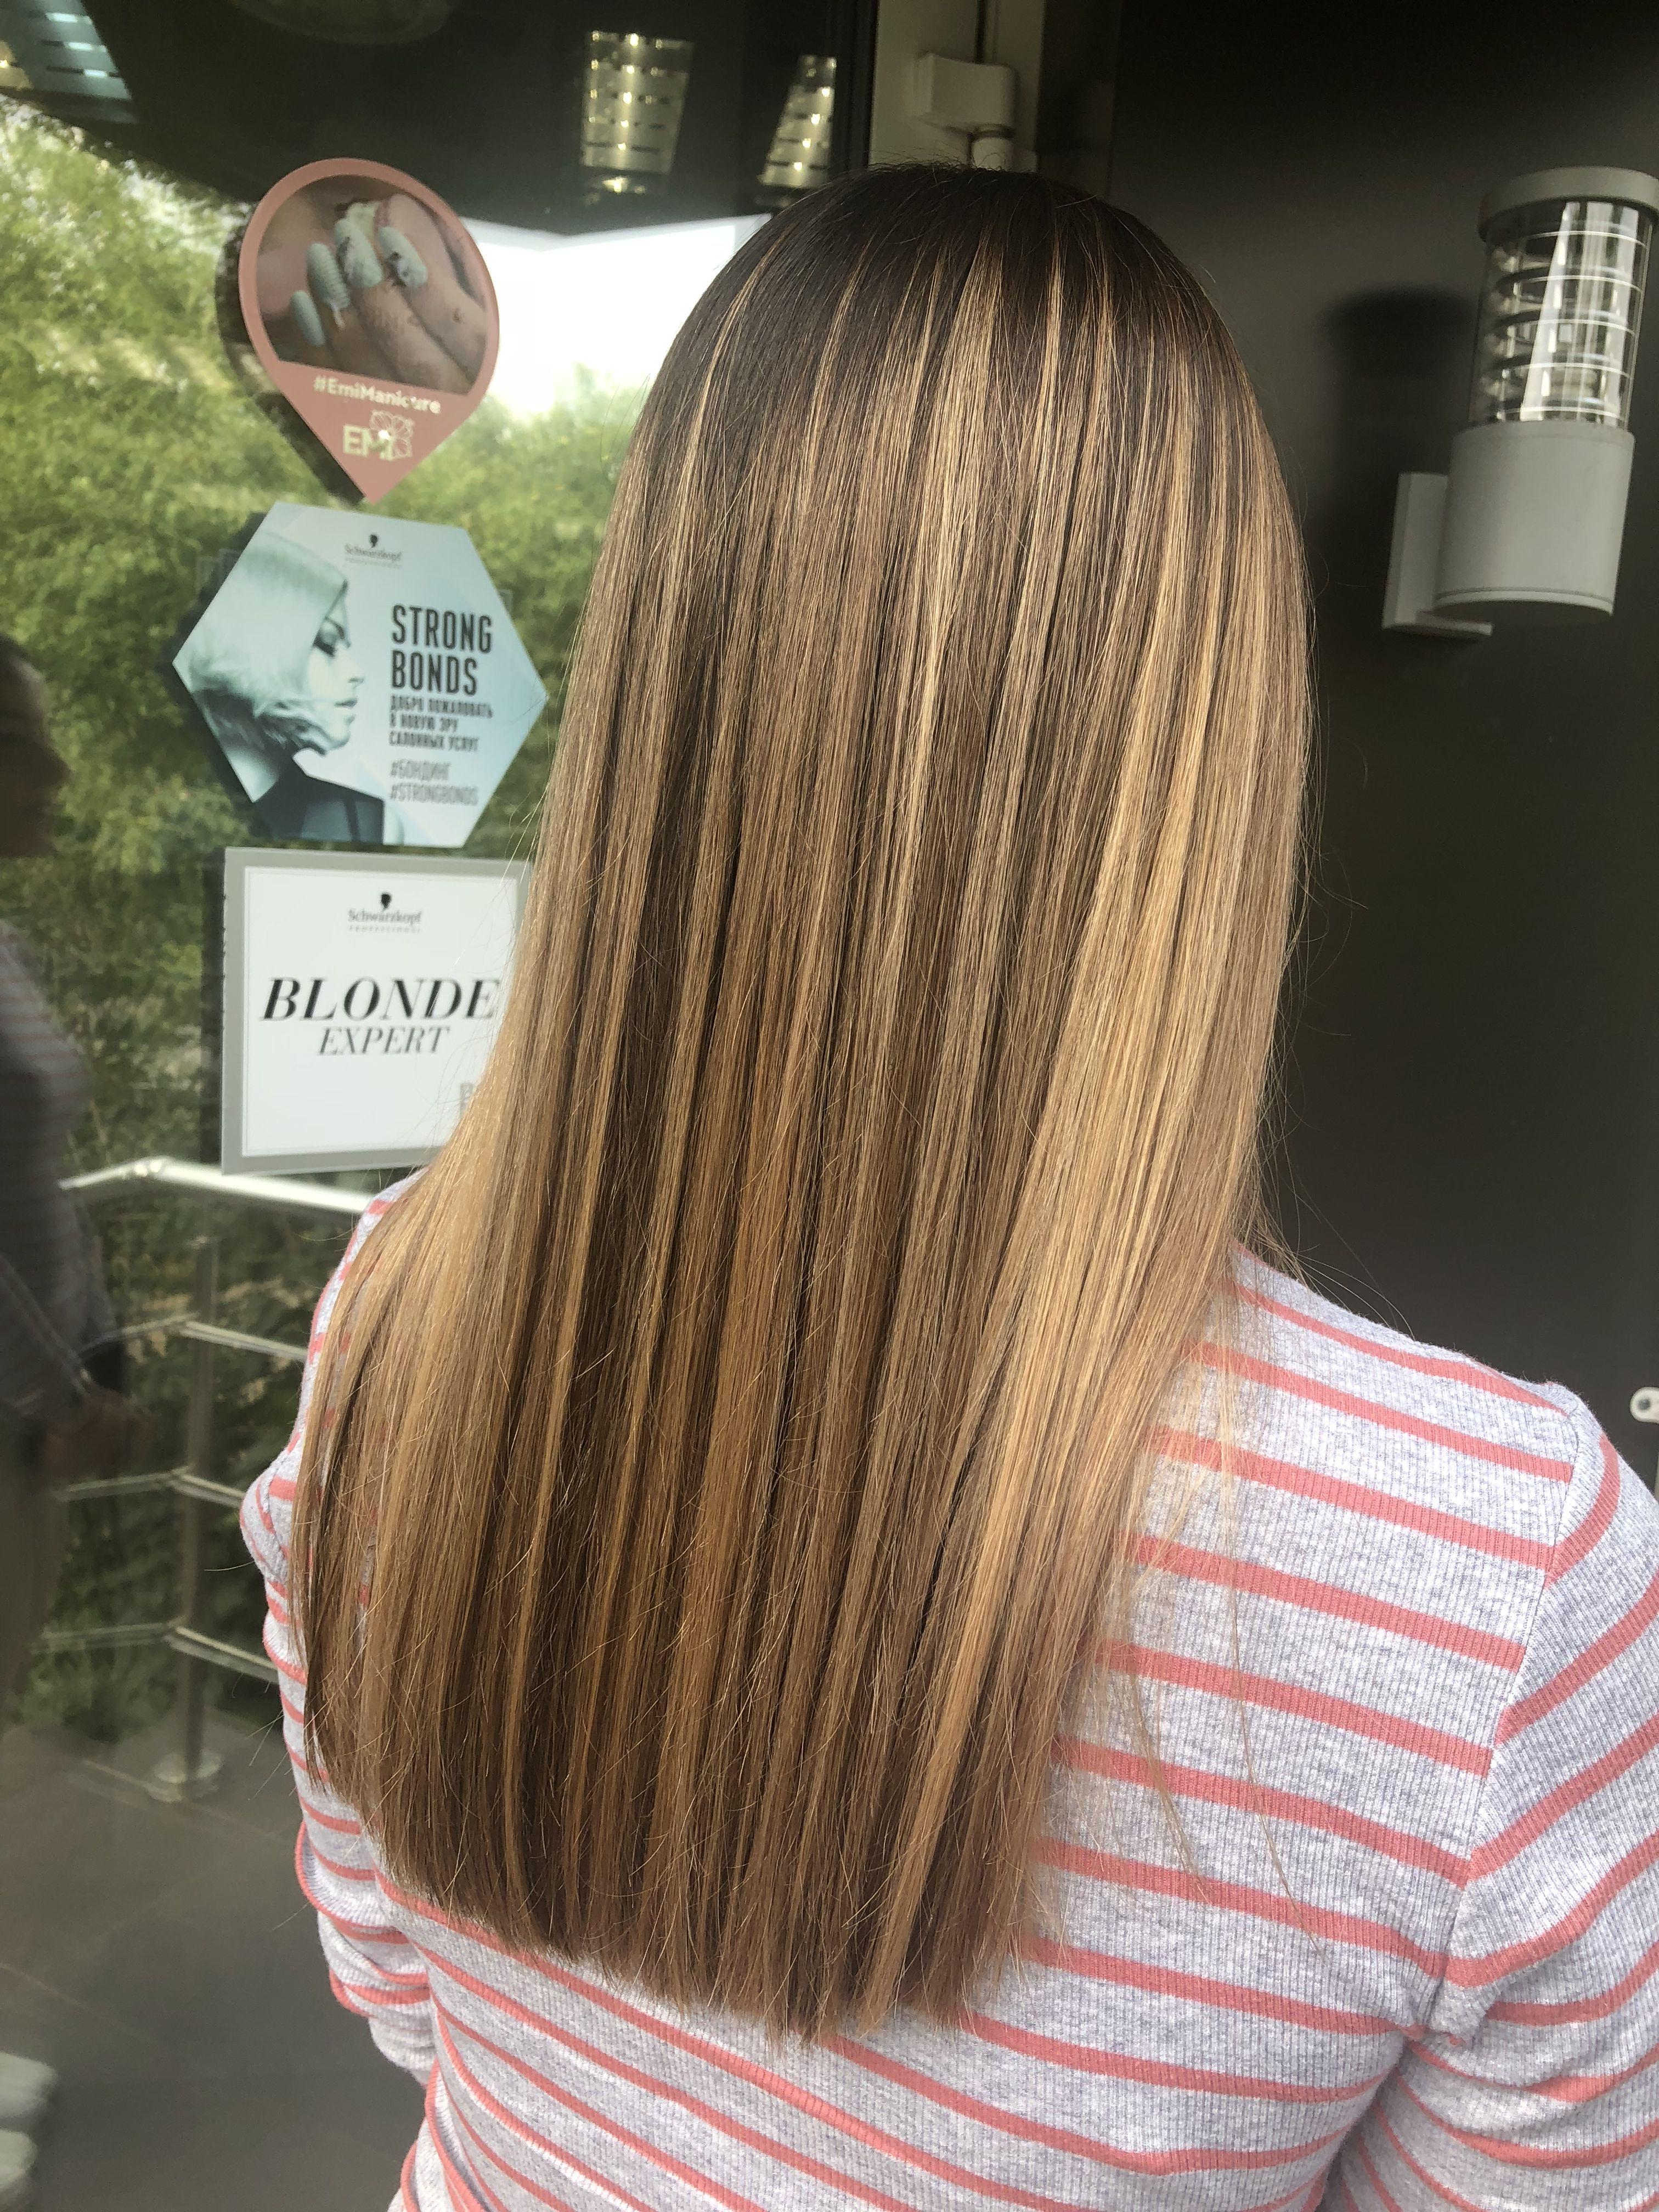 Hair balayage ombre blond hair balayage ombre blond hair